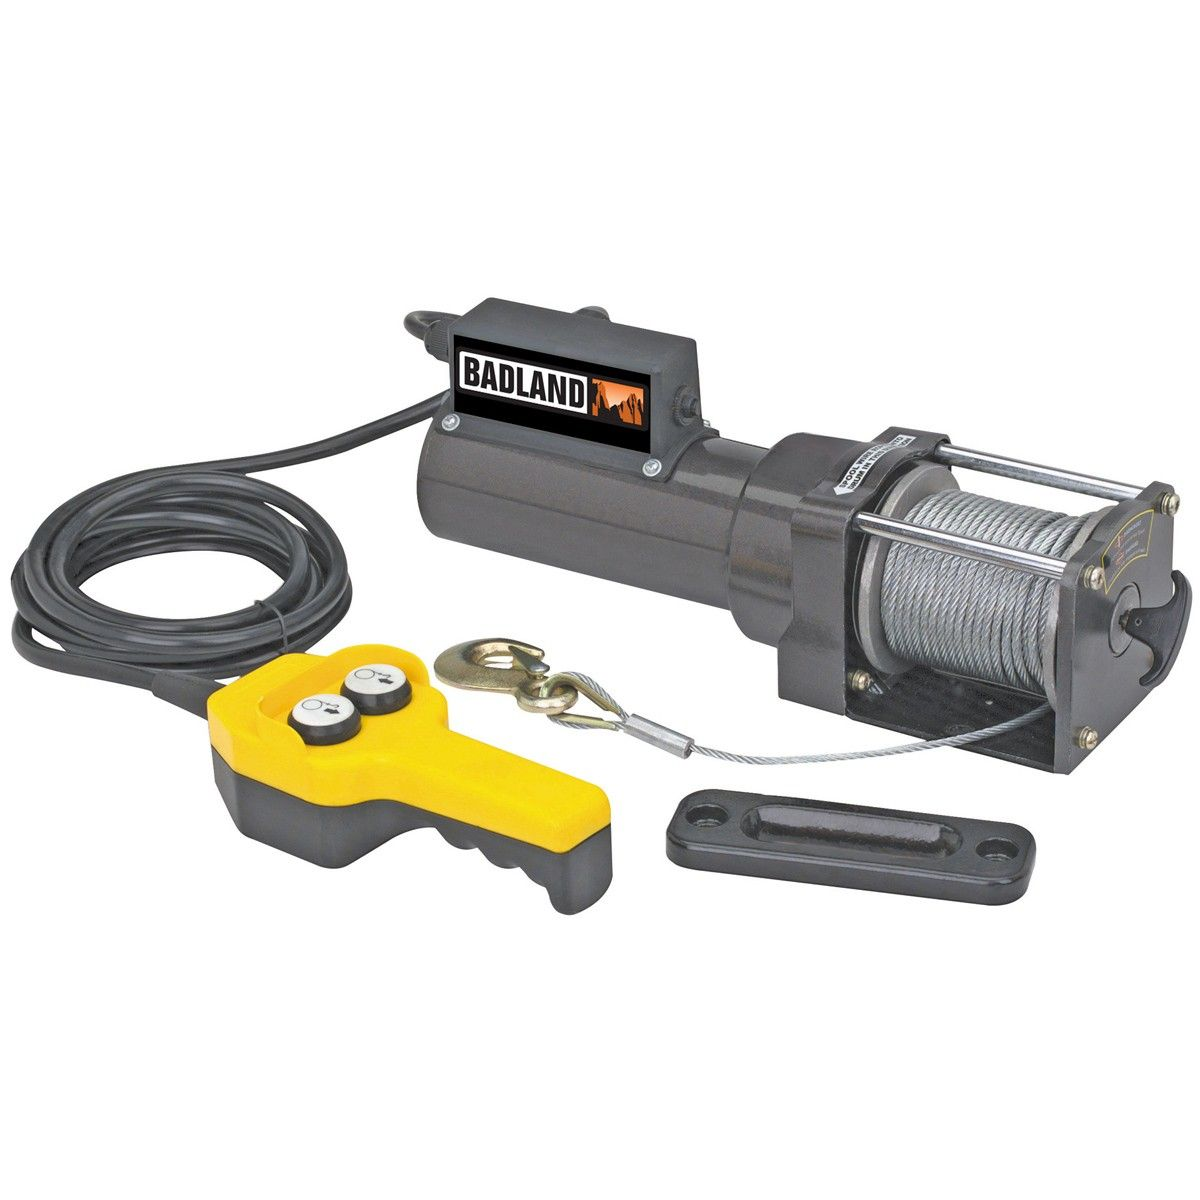 1500 Lbs  Capacity 120 Volt AC Electric Winch | Automotive